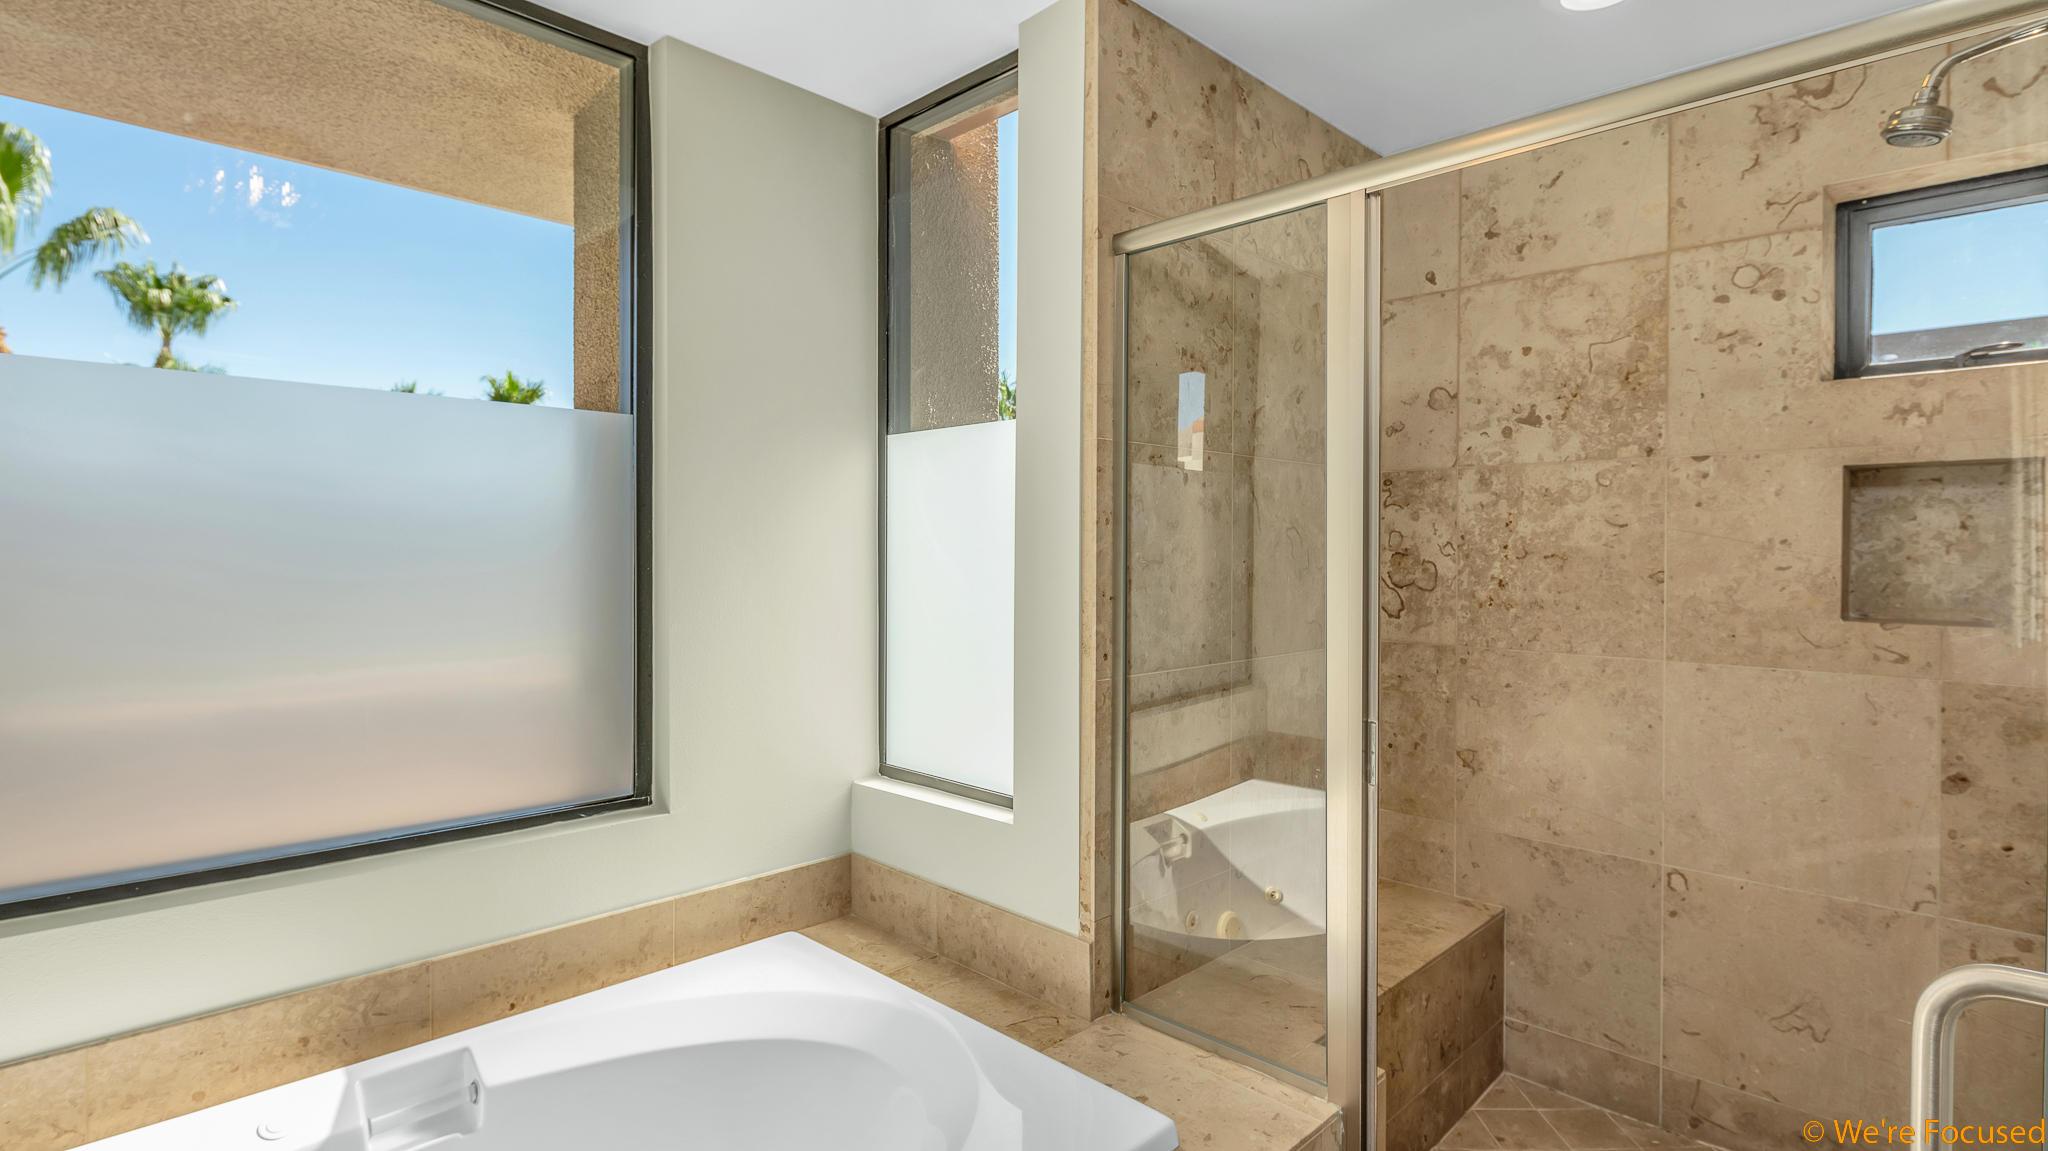 435 N Avenida Caballeros, Palm Springs, California 92262, 2 Bedrooms Bedrooms, ,3 BathroomsBathrooms,Residential,For Sale,435 N Avenida Caballeros,219045564